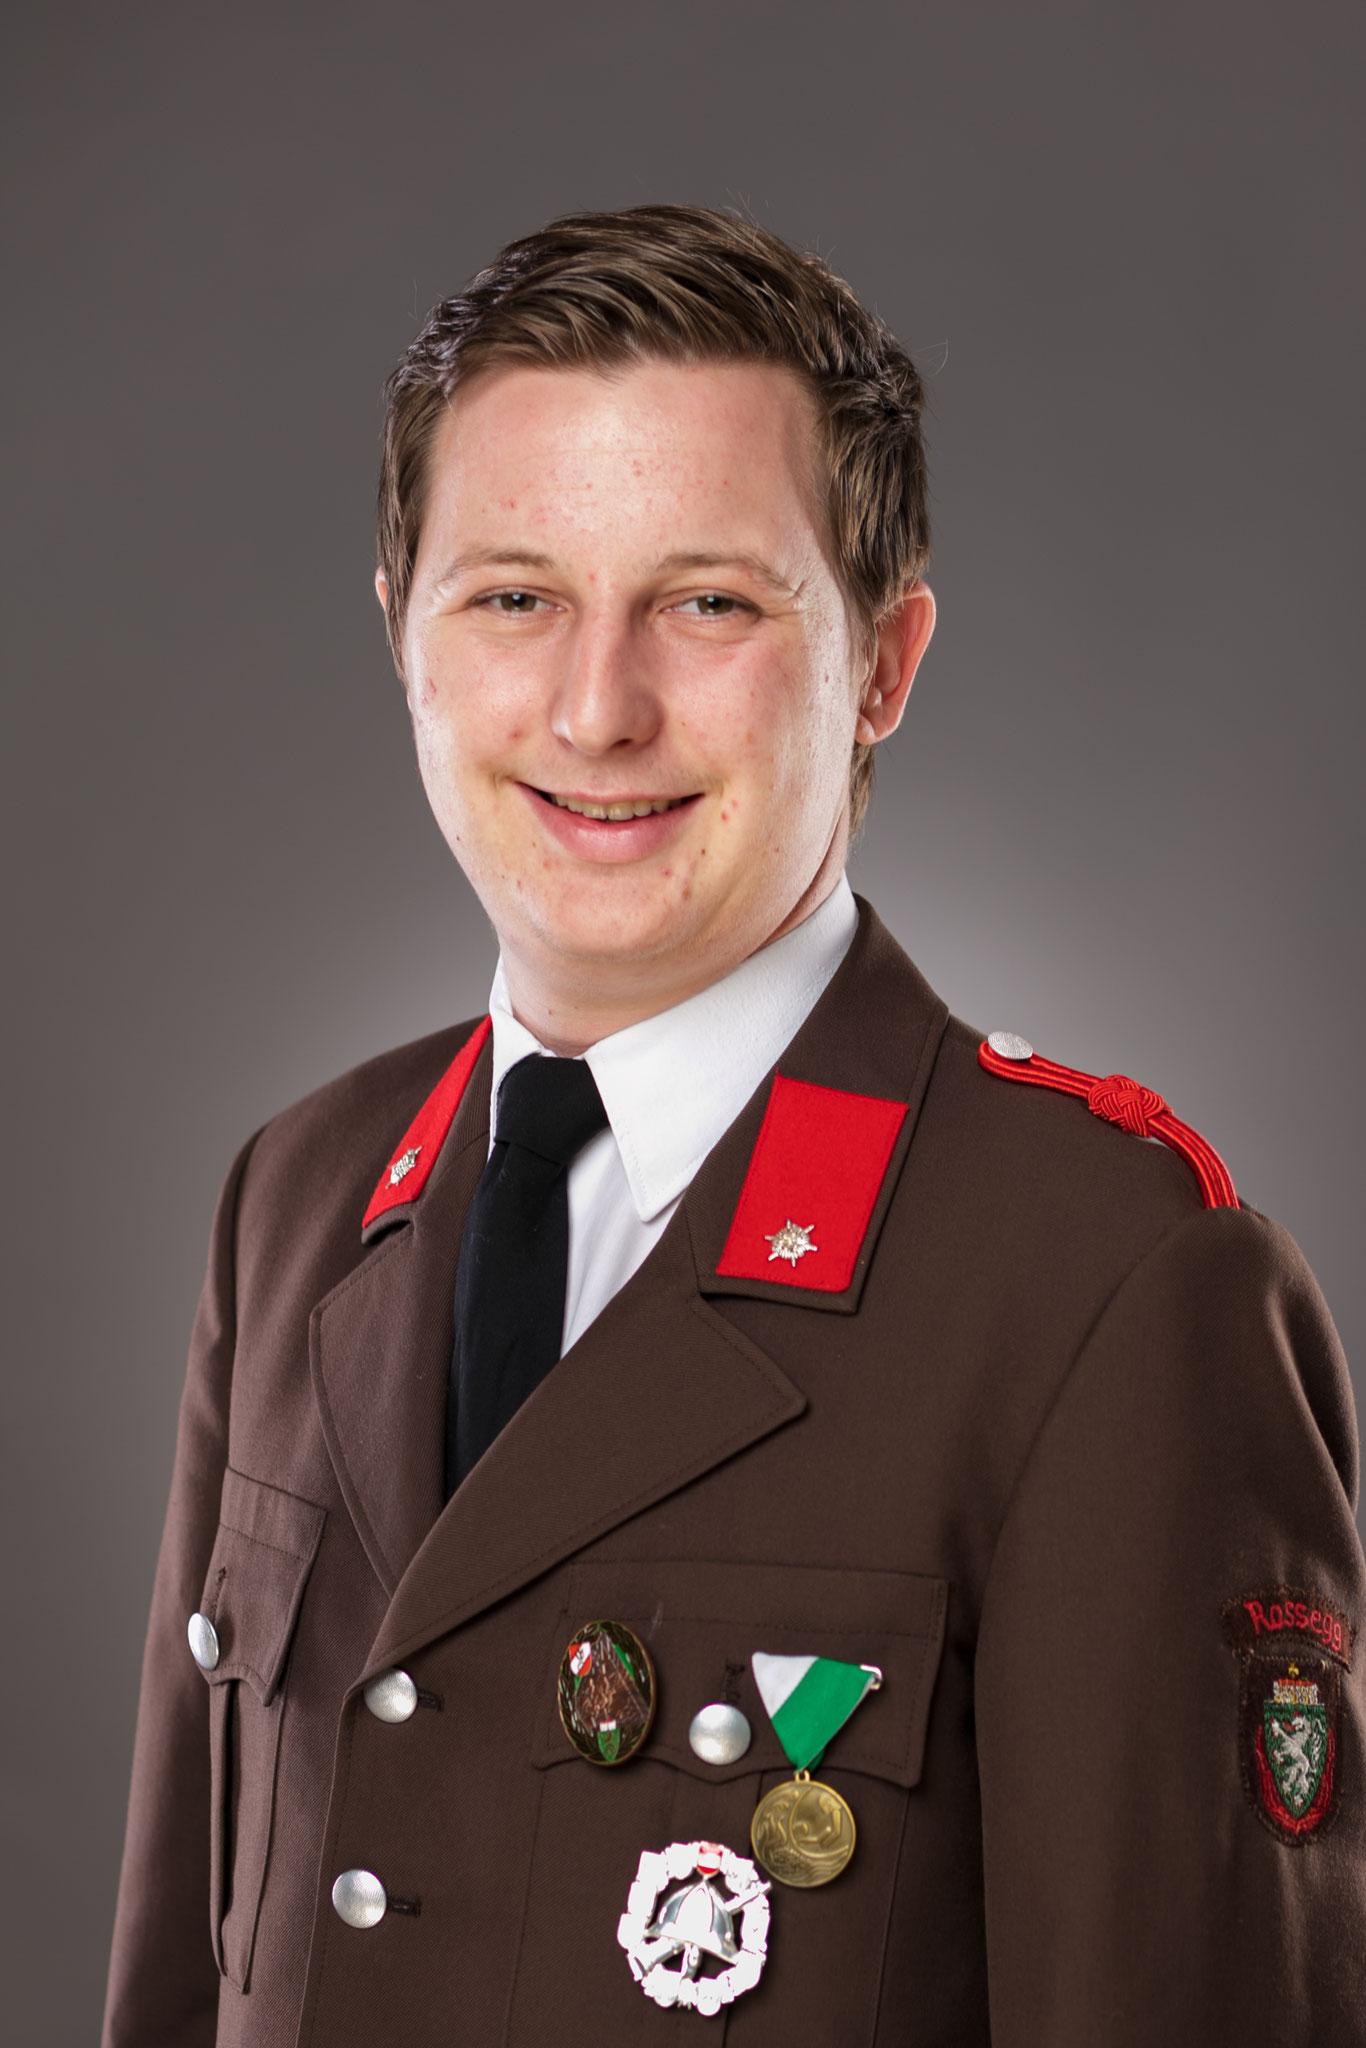 Kommandant-Stellvertreter OBI NINAUS Daniel